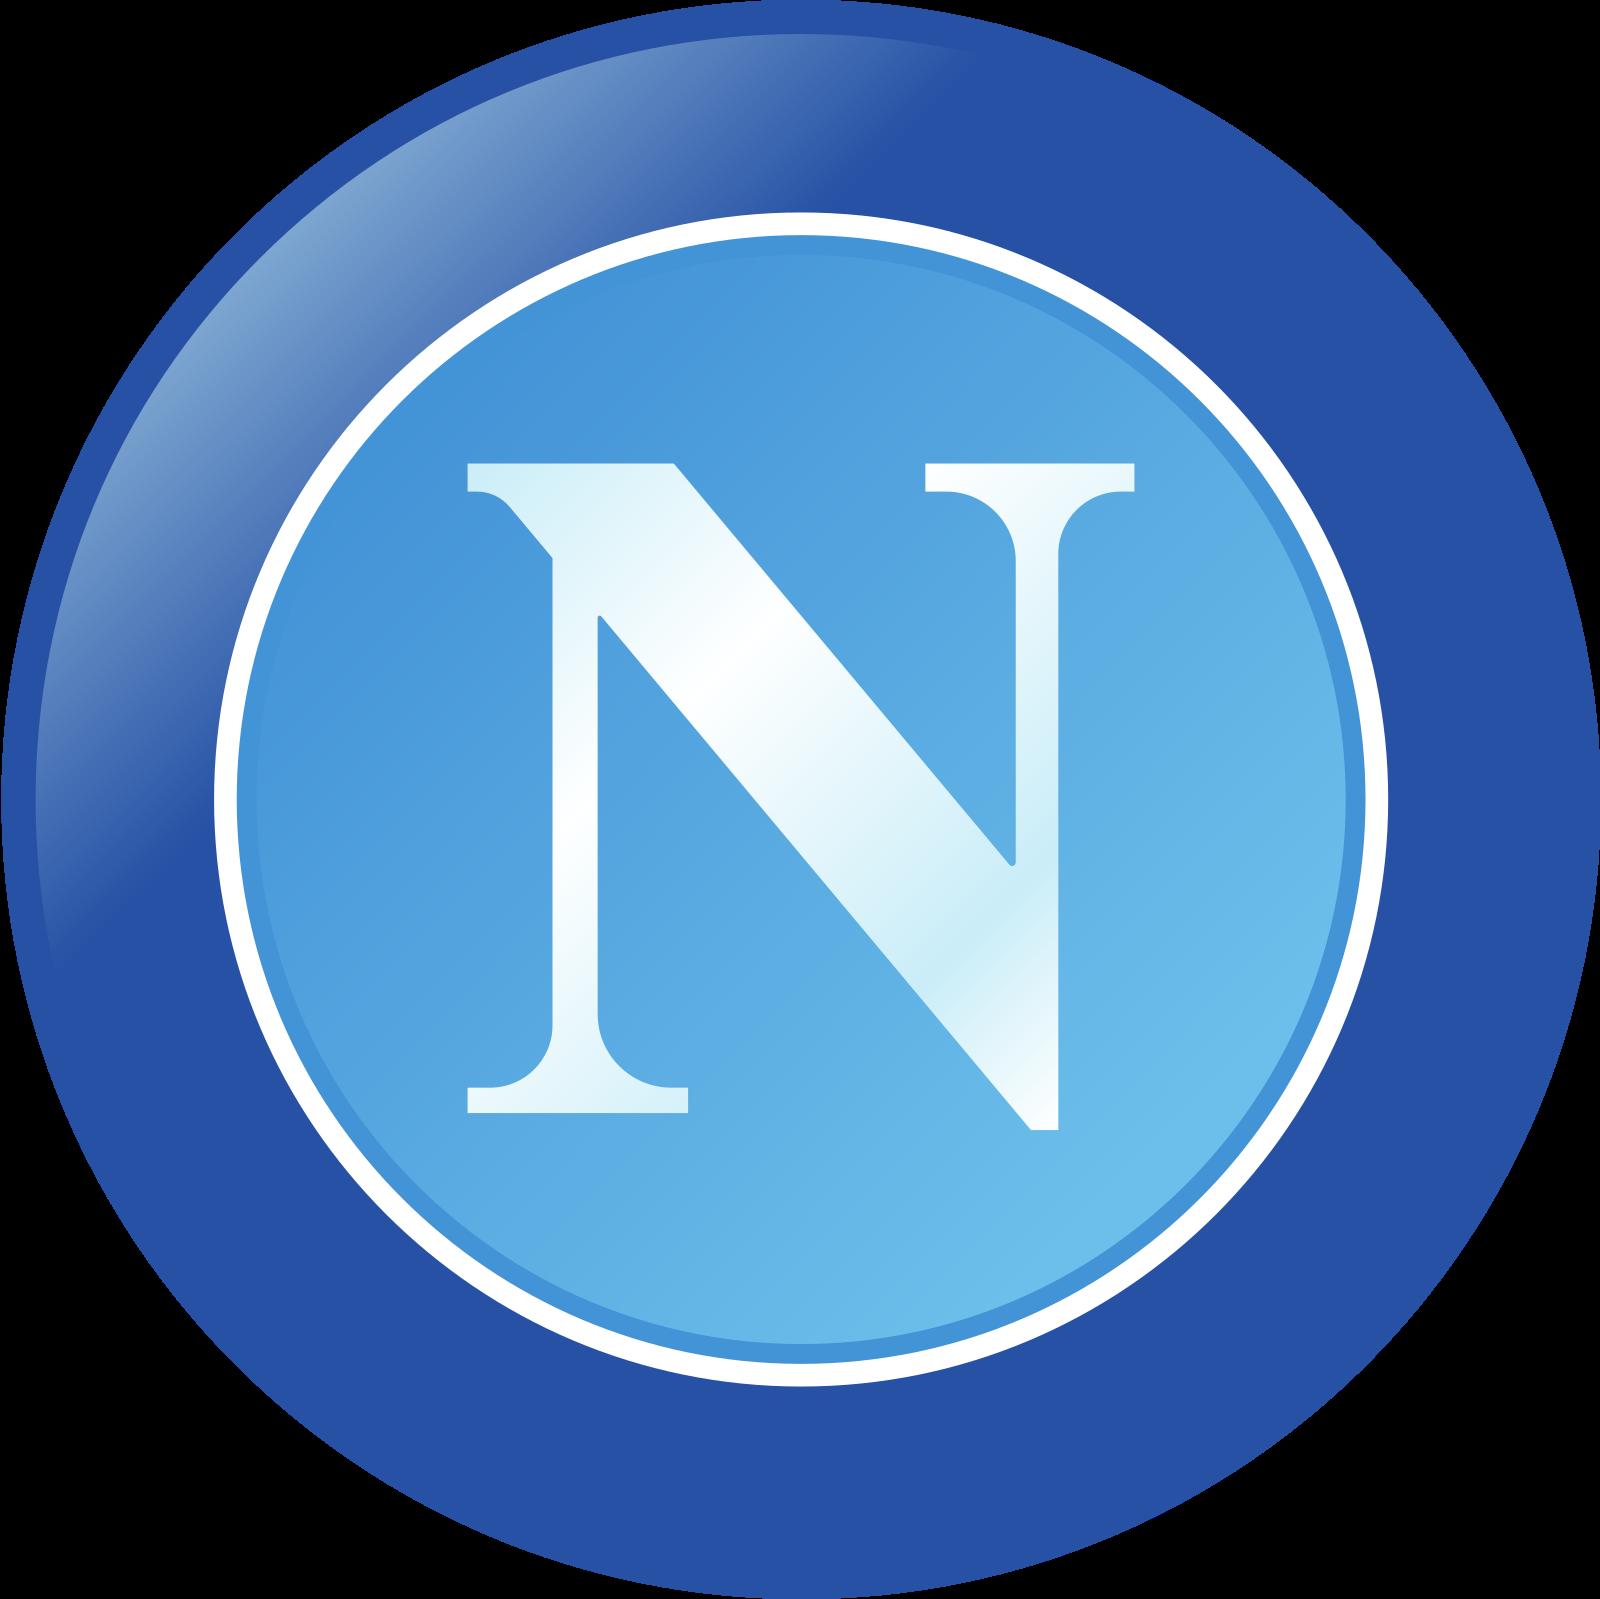 napoli-logo-escudo-2